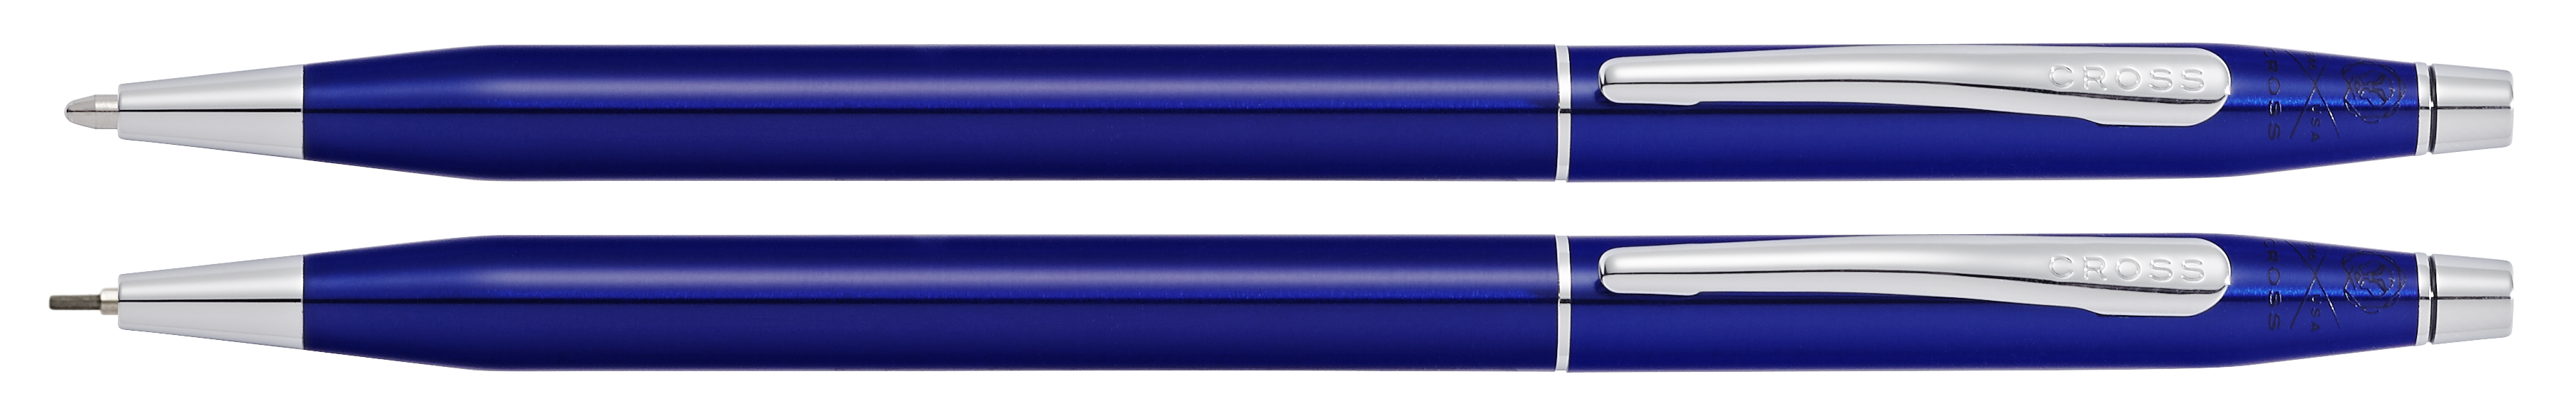 Classic Century Translucent Blue Lacquer Ballpoint Pen and Pencil Set